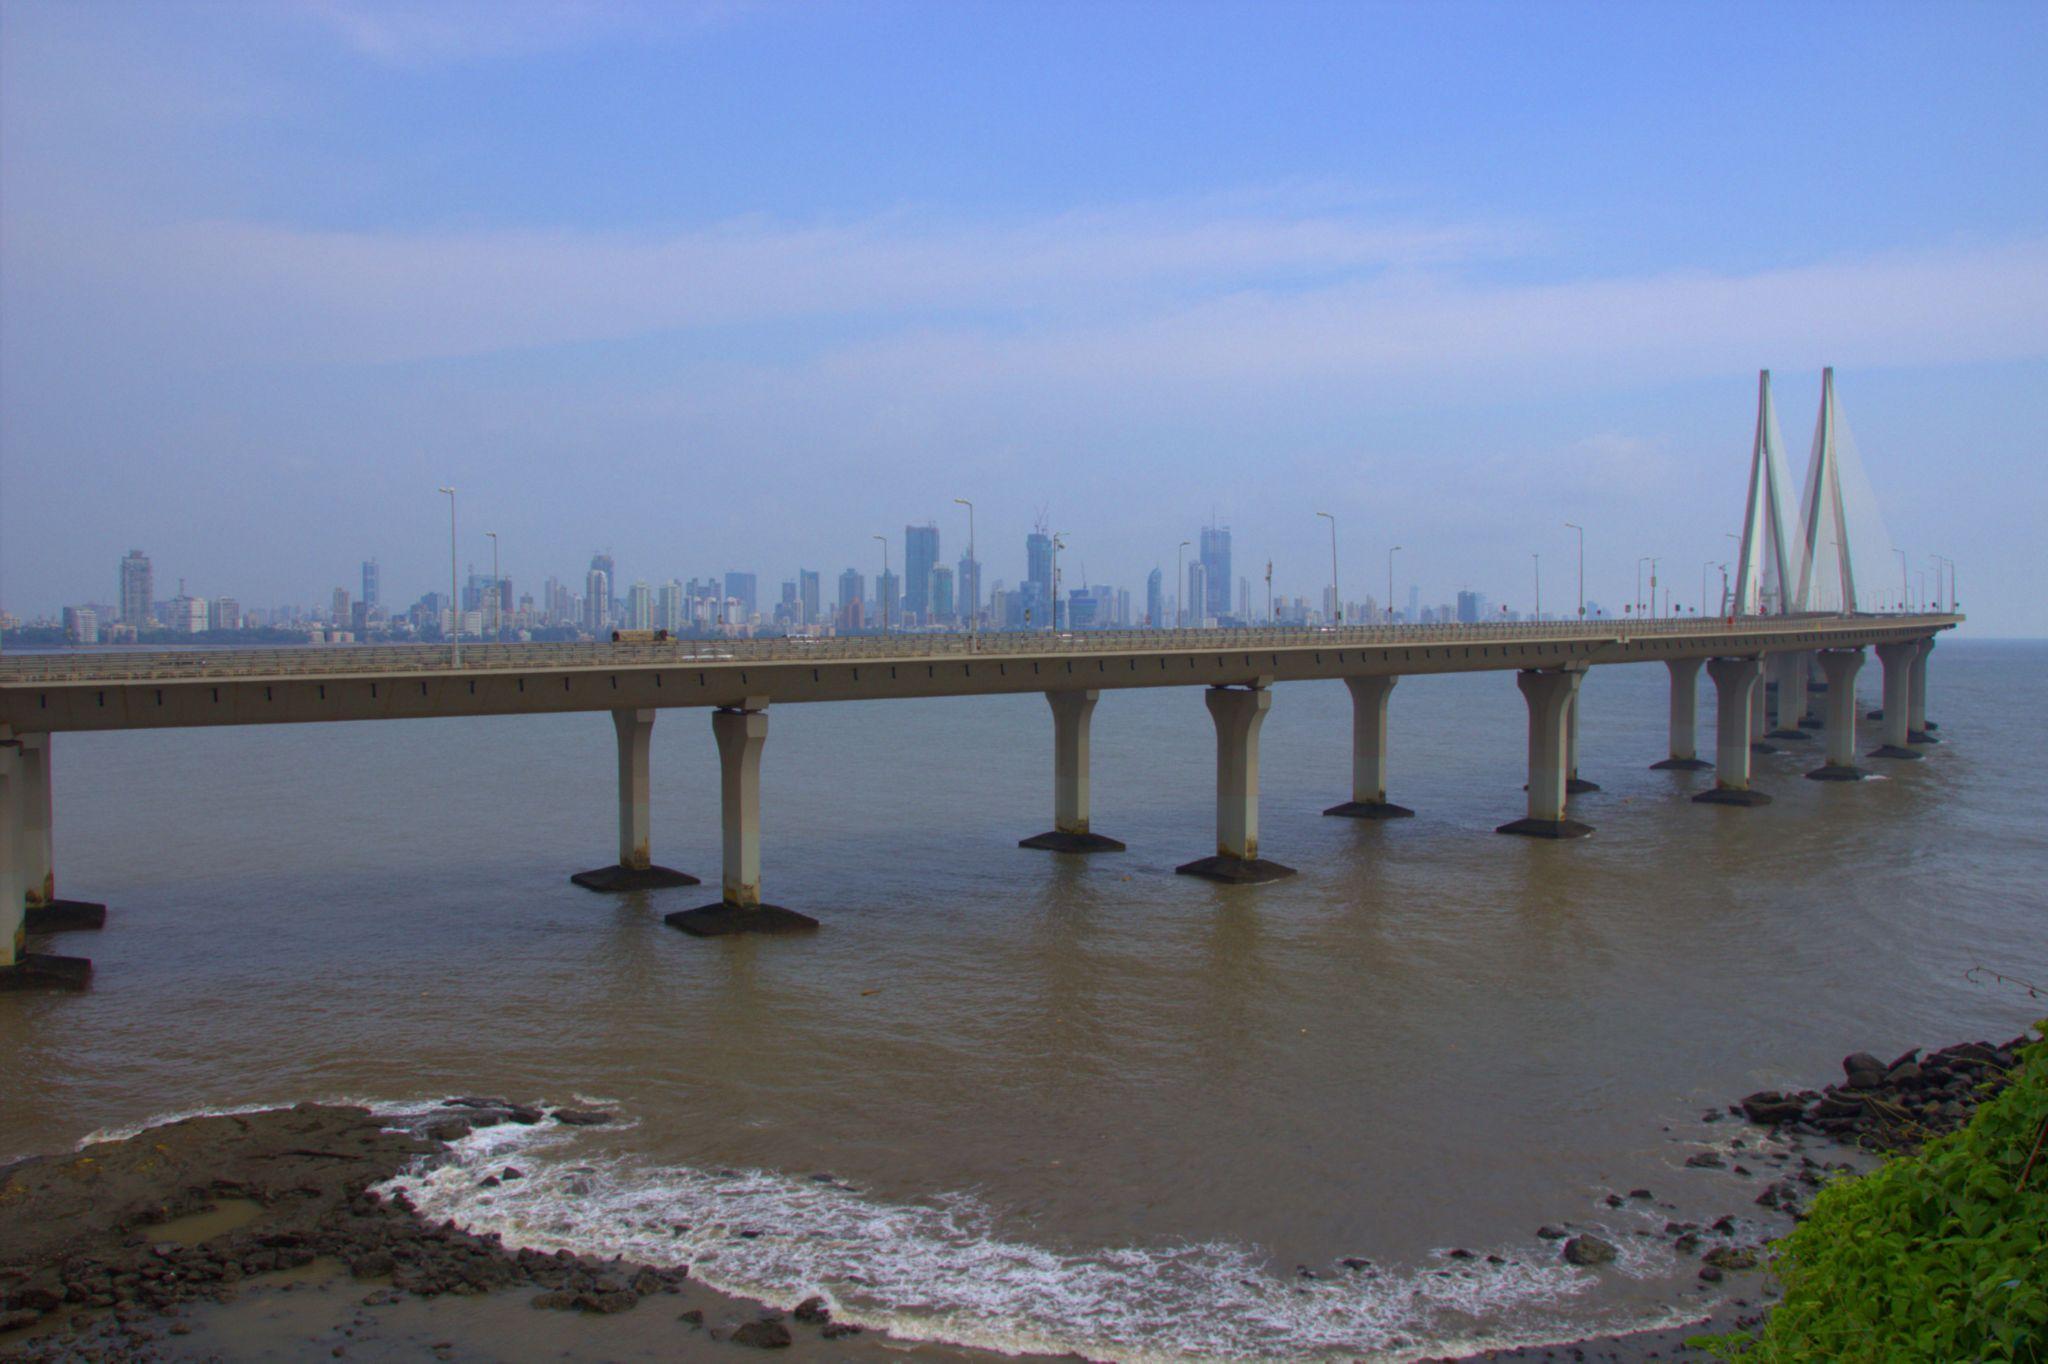 City of Mumbai, Well most of it :P by Dineshnath Baluchamy